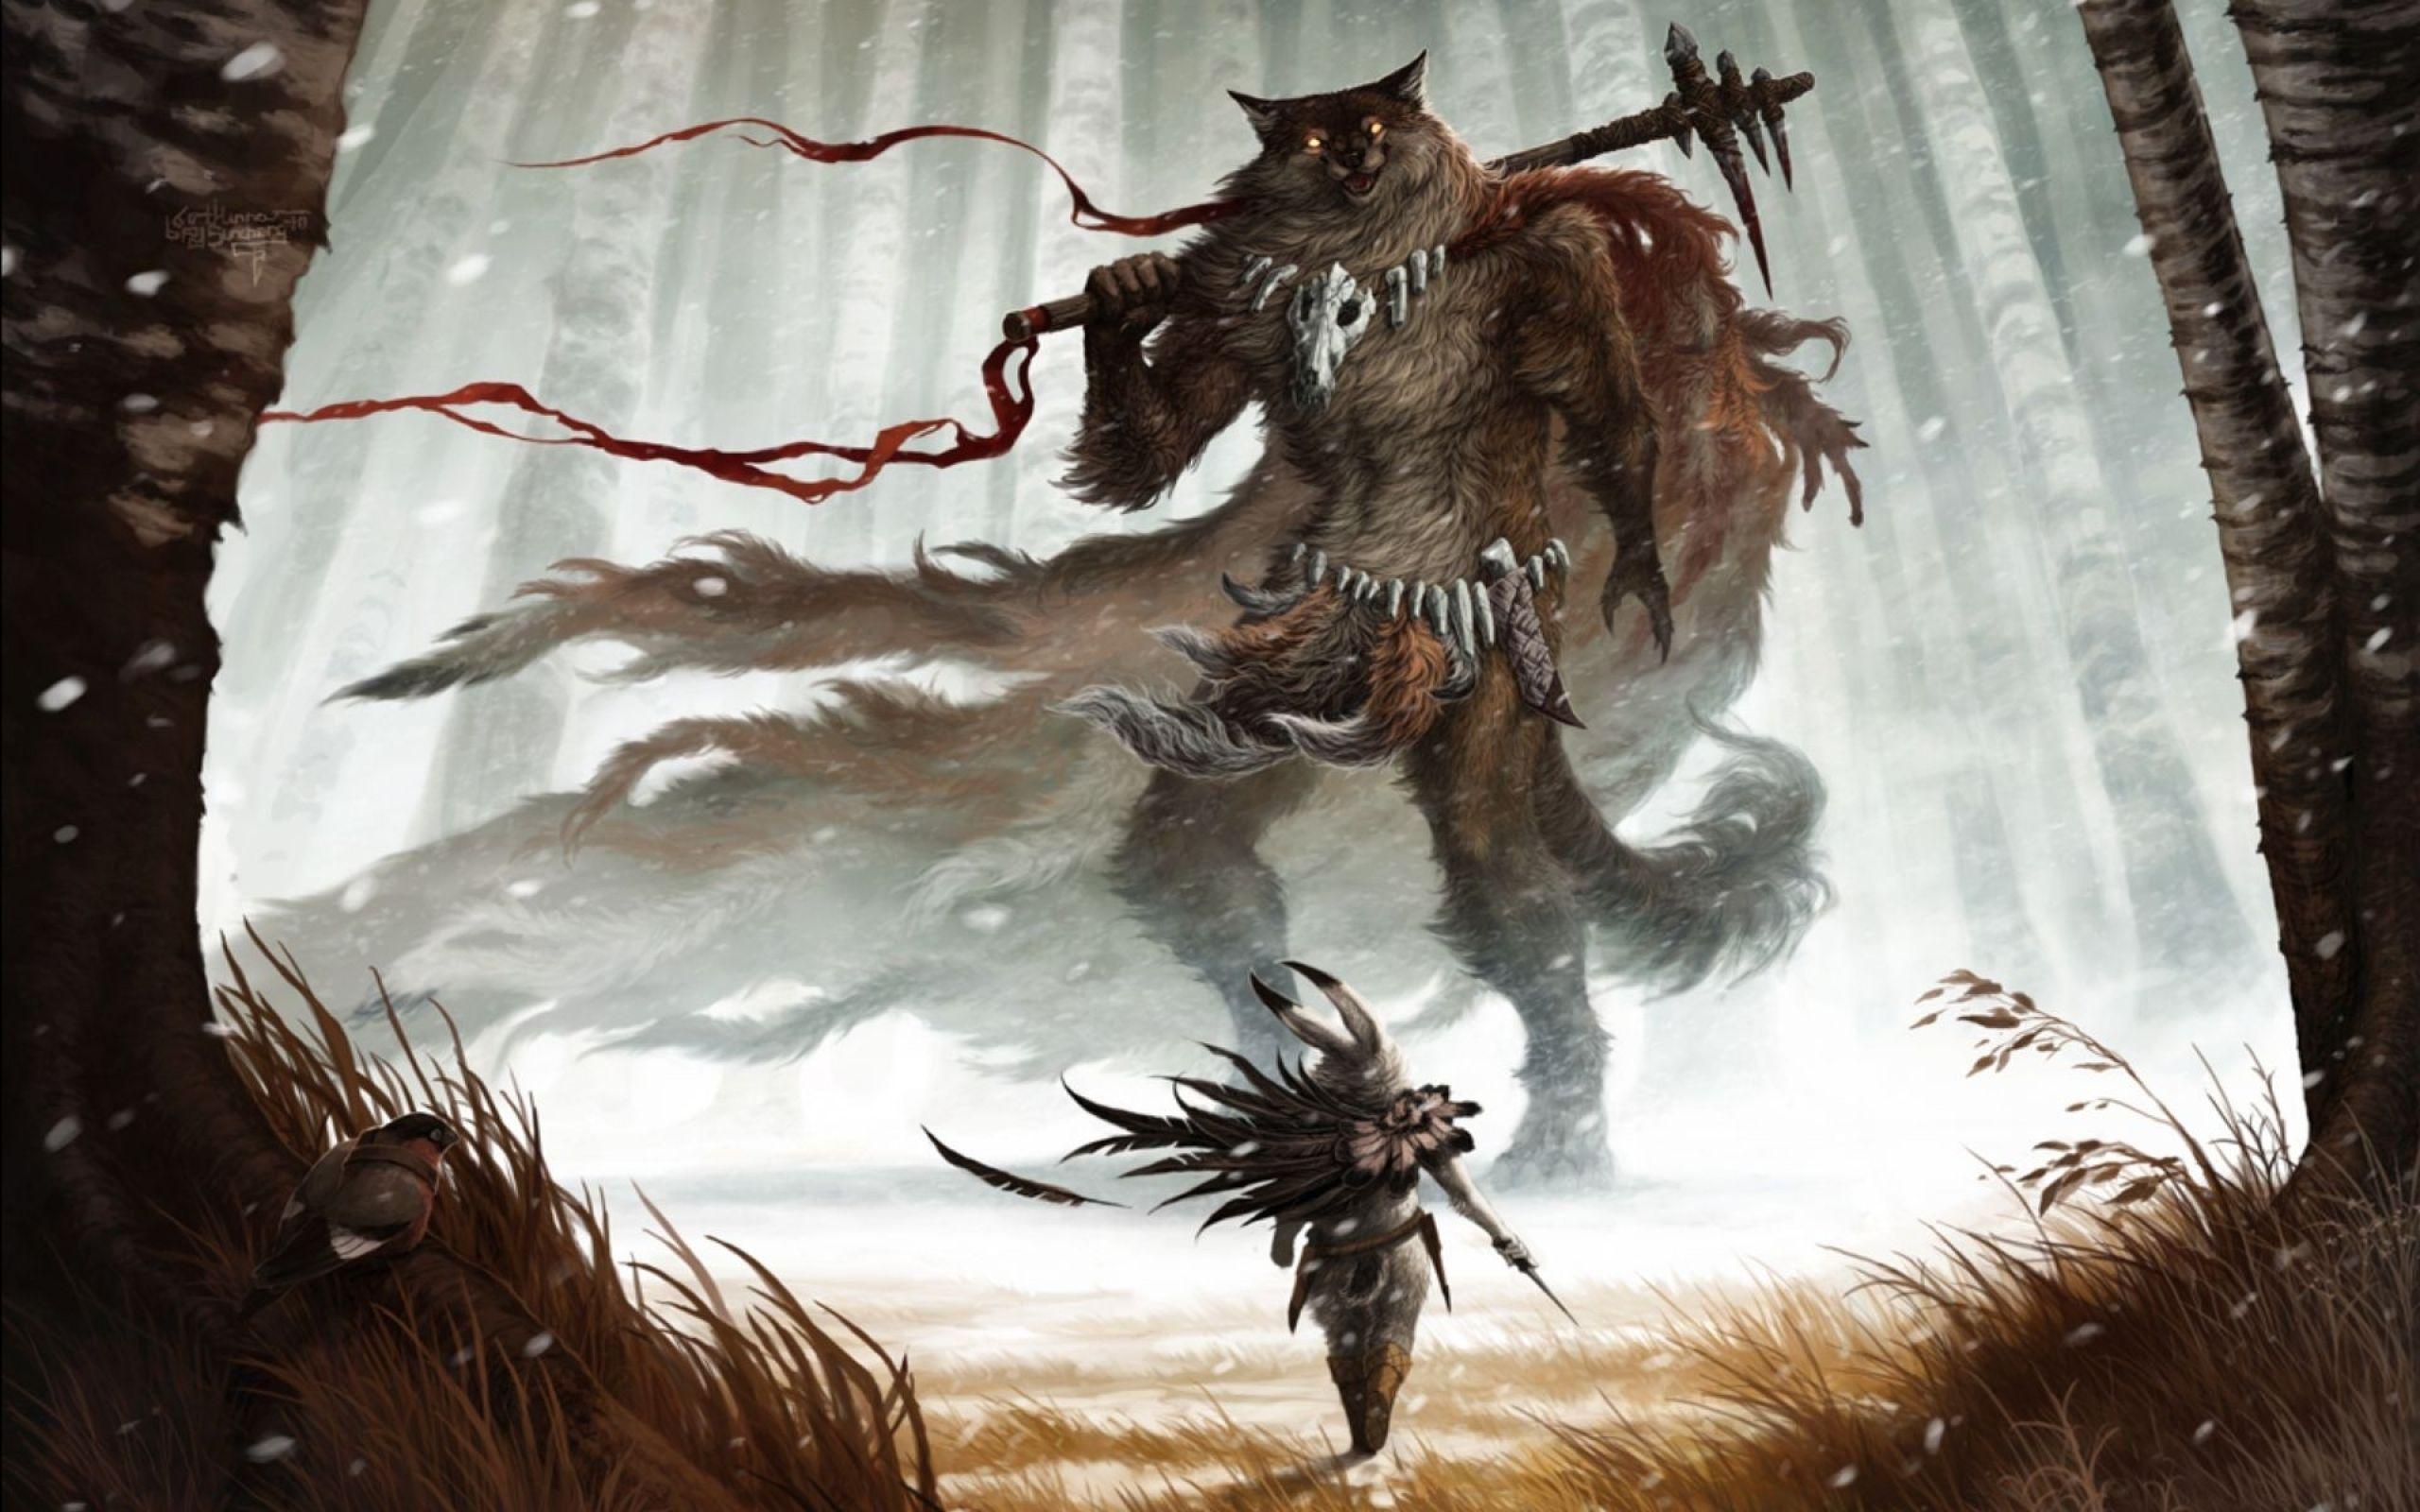 Dreamy Fantasy Wolf Monster Artwork Wallpaper Art Monster Artwork Warriors Wallpaper